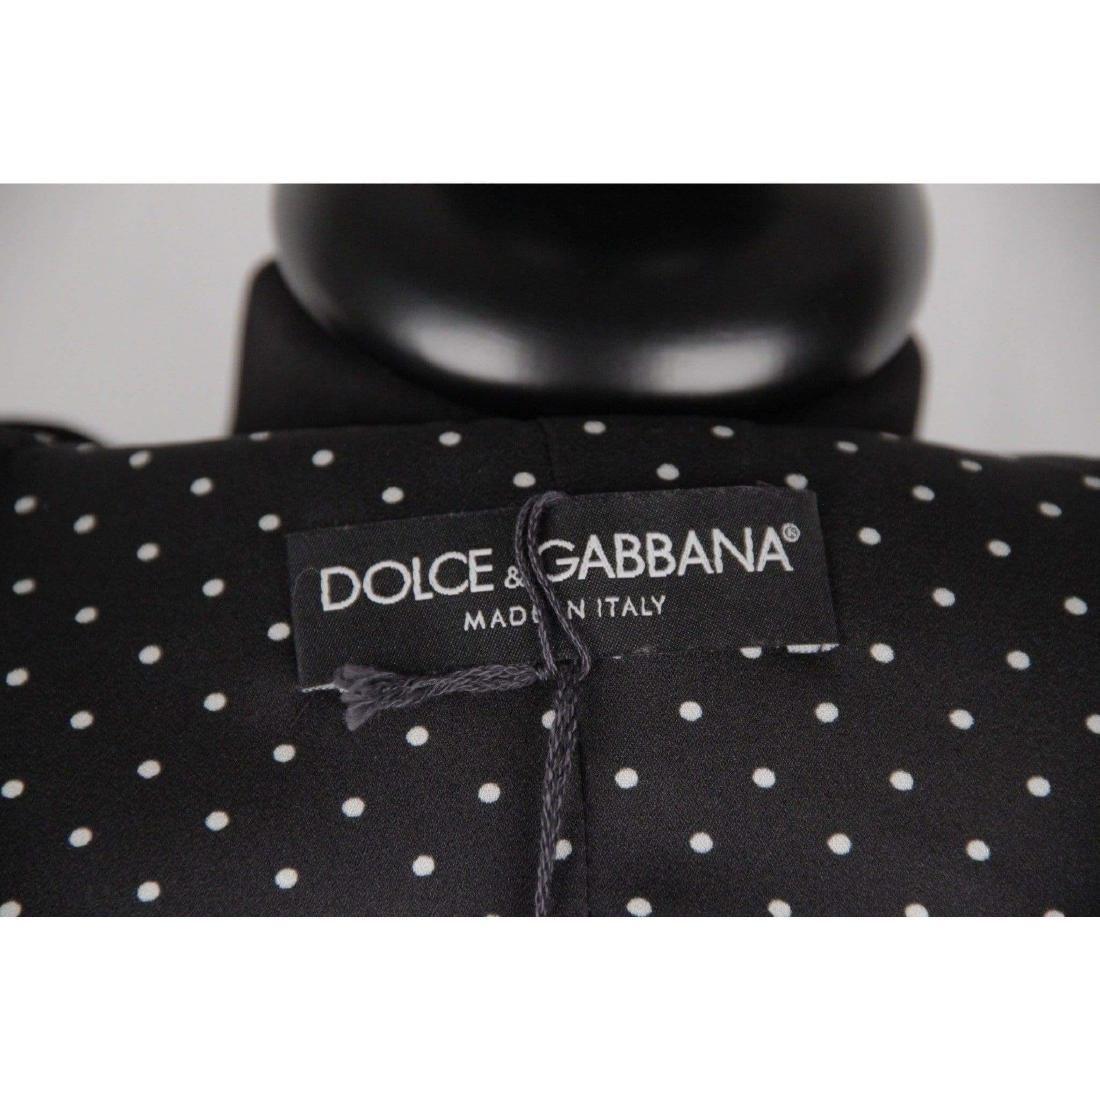 DOLCE & GABBANA Herringbone Wool Blend SUIT Blazer & - 7